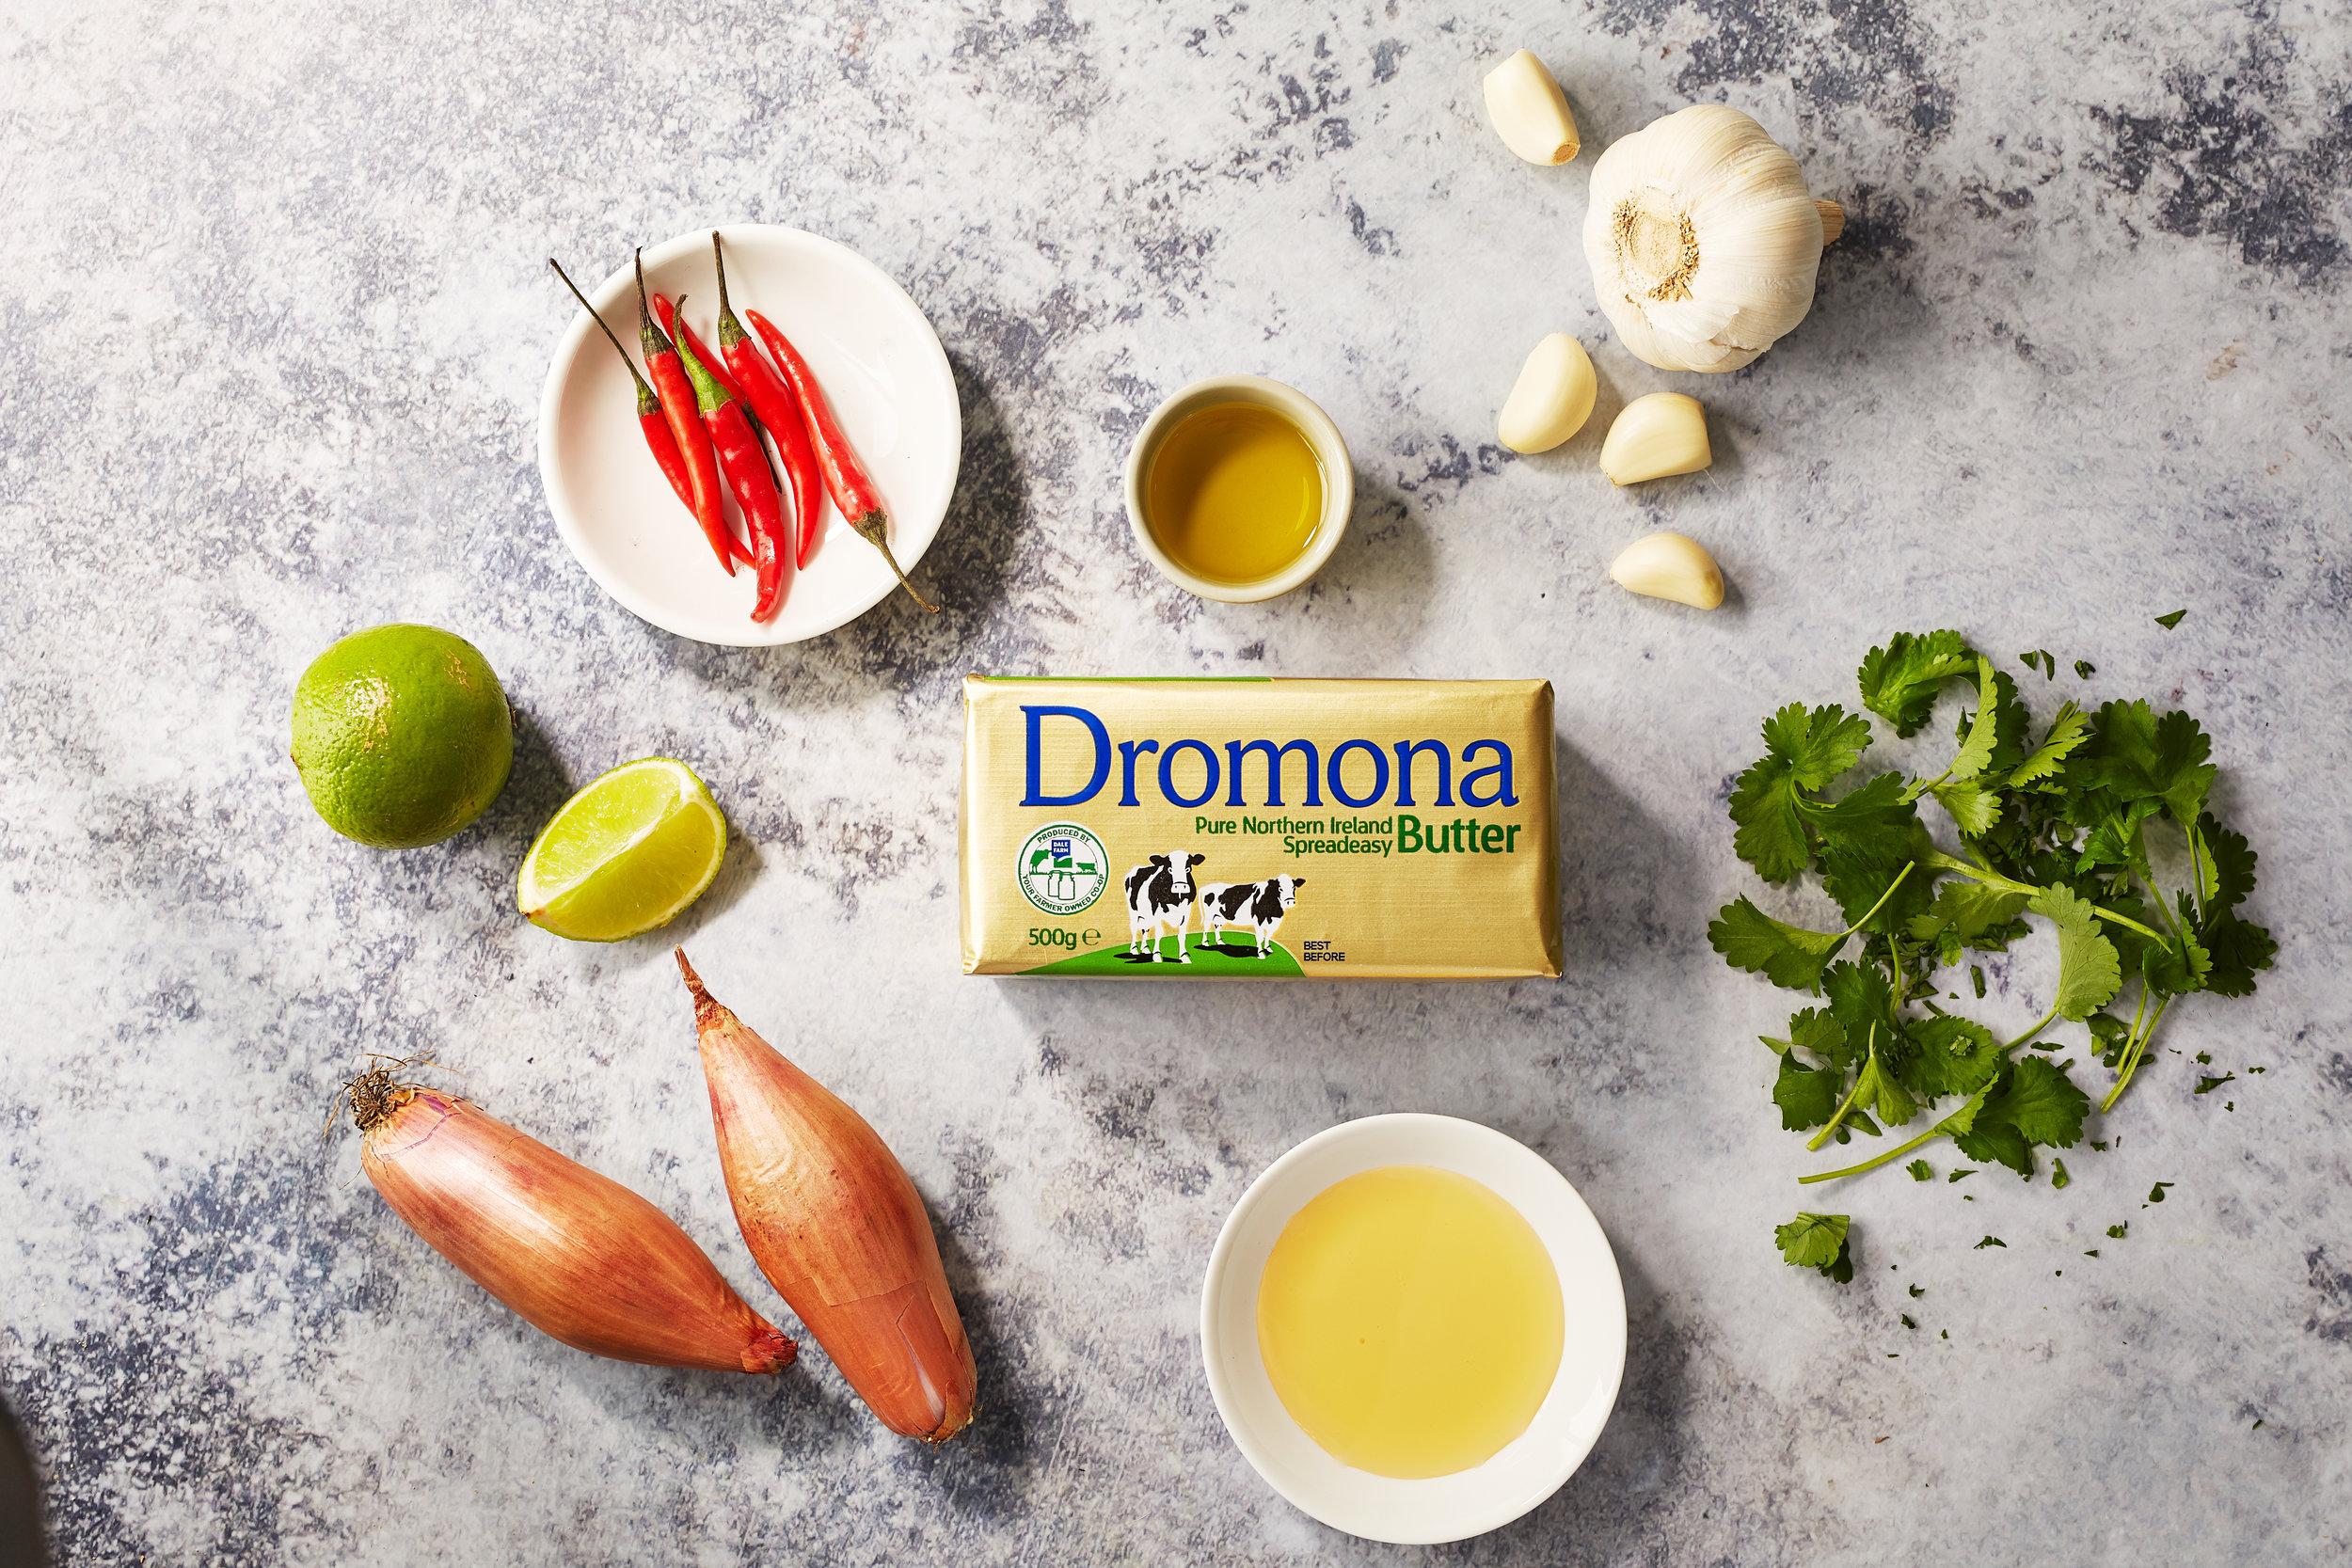 Dromona Phase 2 053.jpg